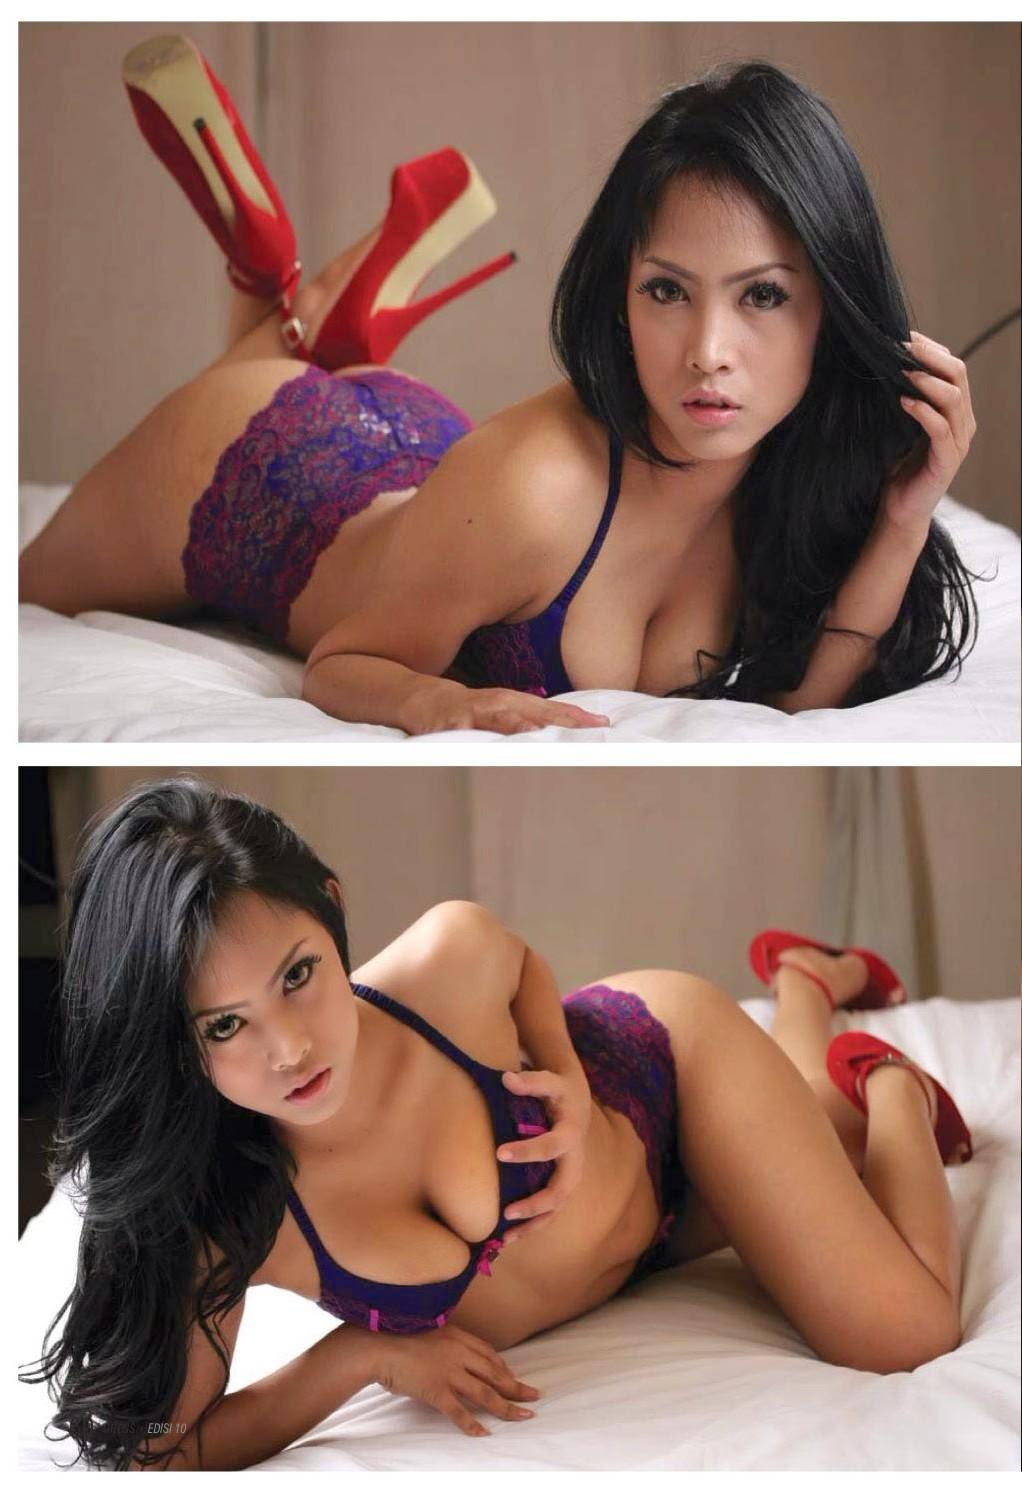 foto ngentot memek  bugil mesum Foto Seksi Imey Model Sexy Majalah Gress